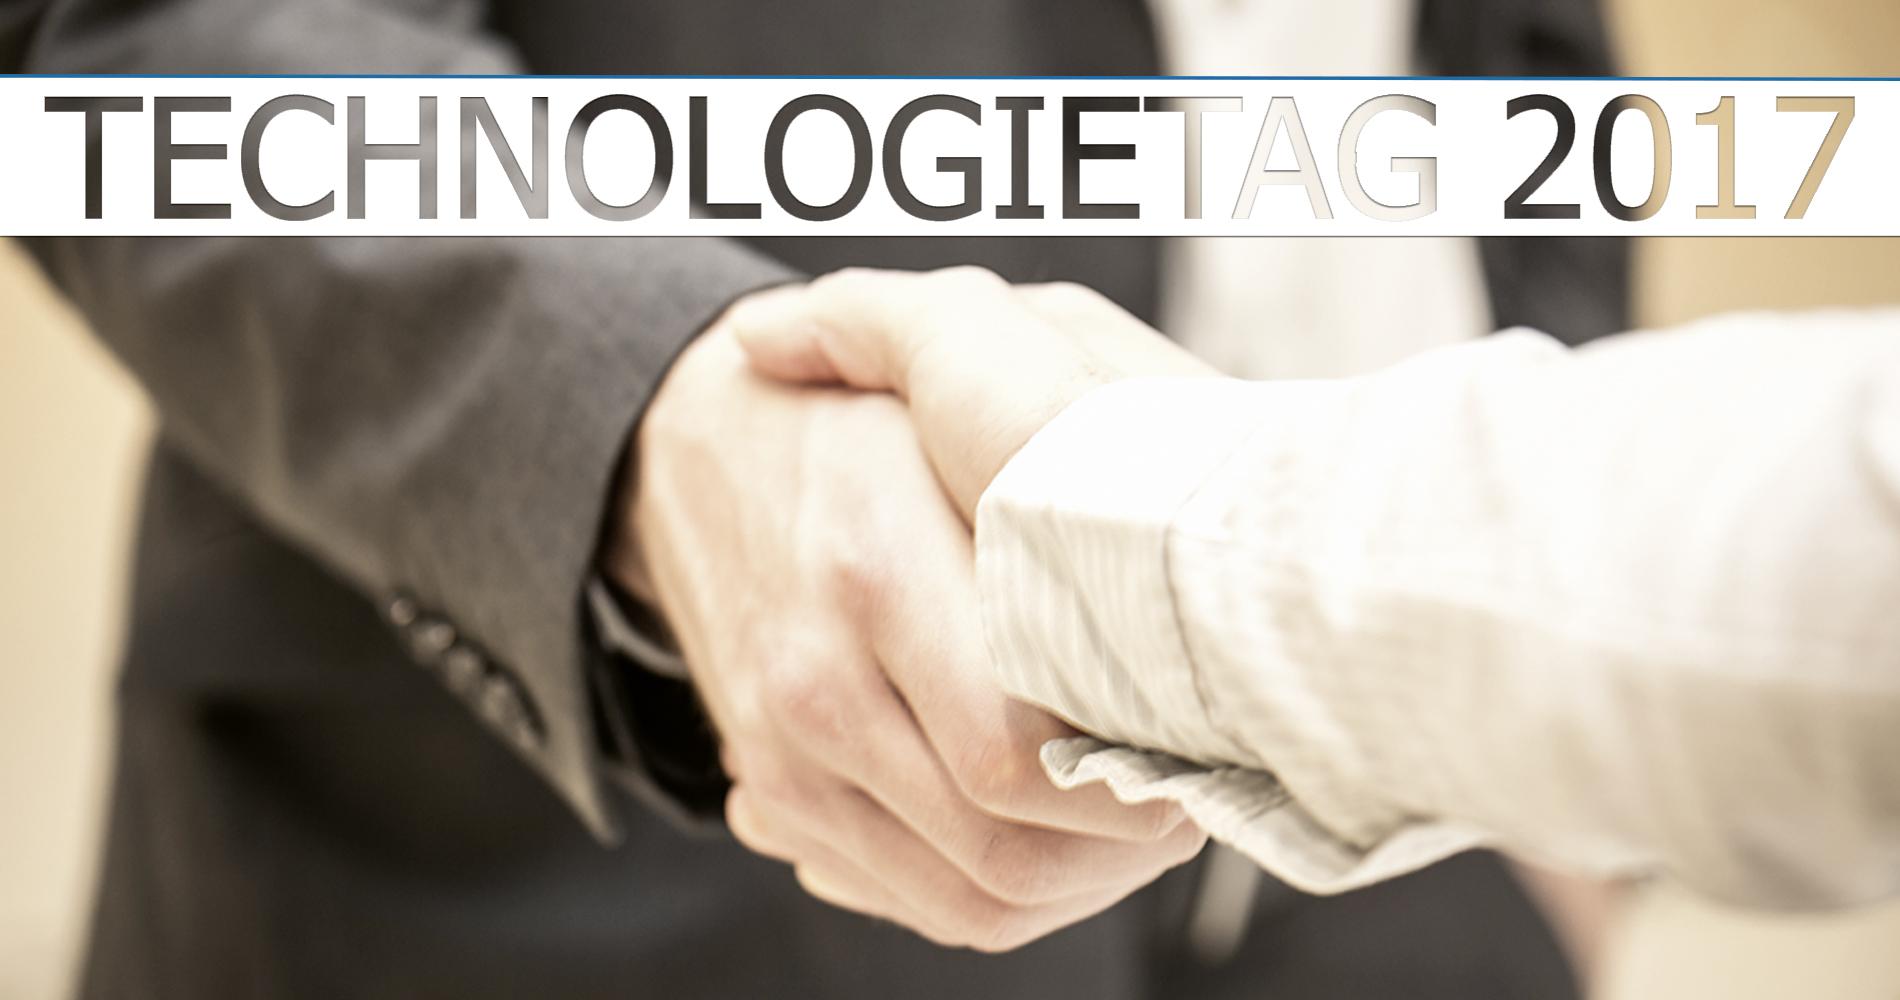 Veranstaltung Technologietag EBM Digitalisierung Kundenveranstaltung Informationsveranstaltung